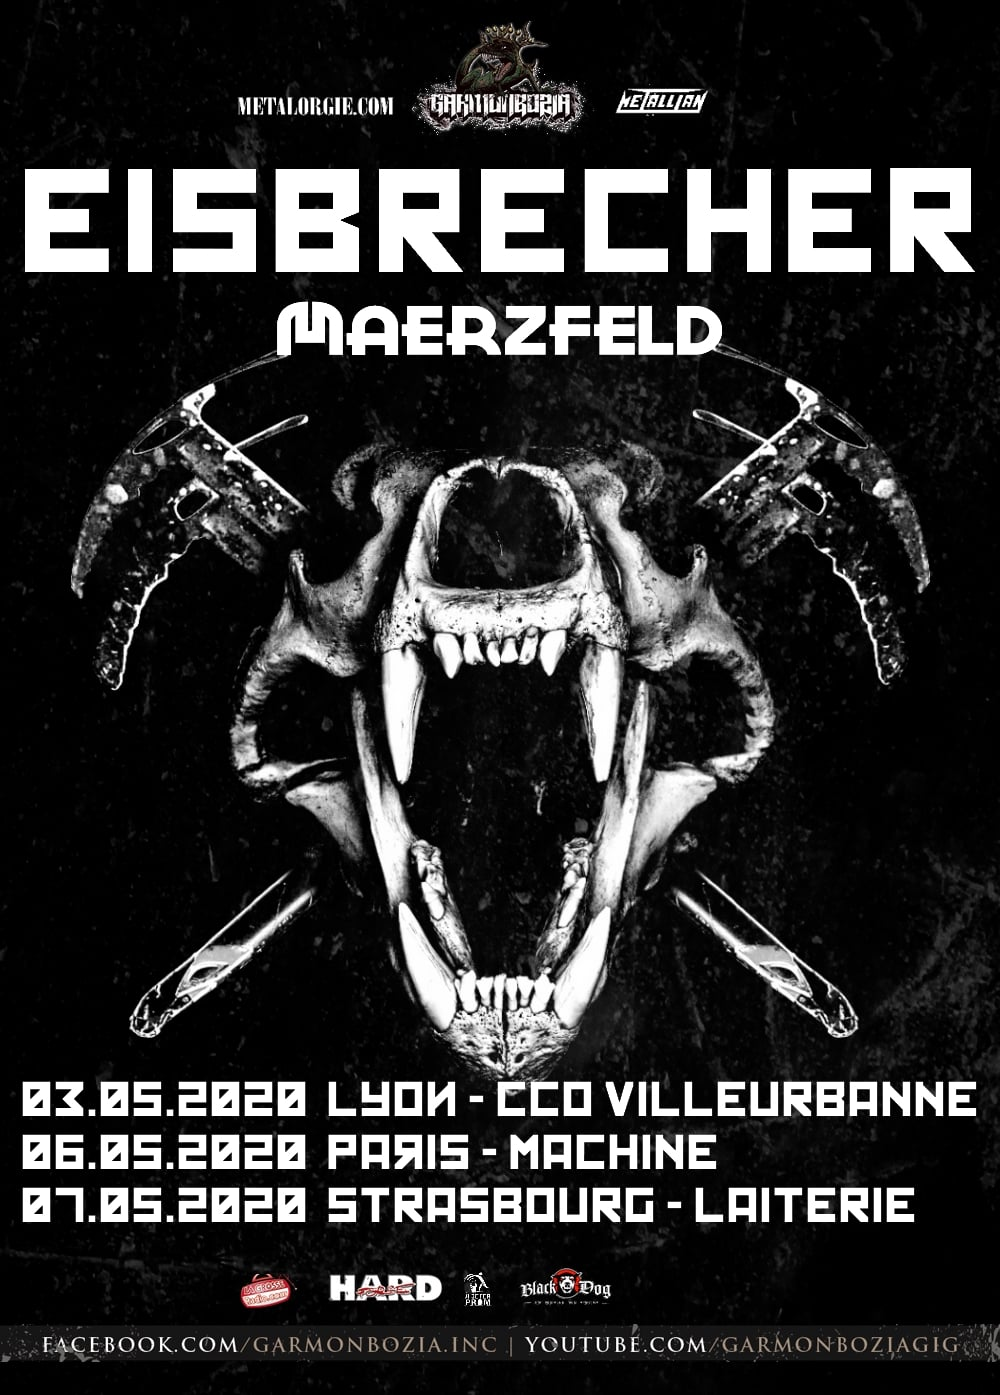 Eisbrecher + Maerzfeld @ La Machine (Paris) - 06 mai 2020